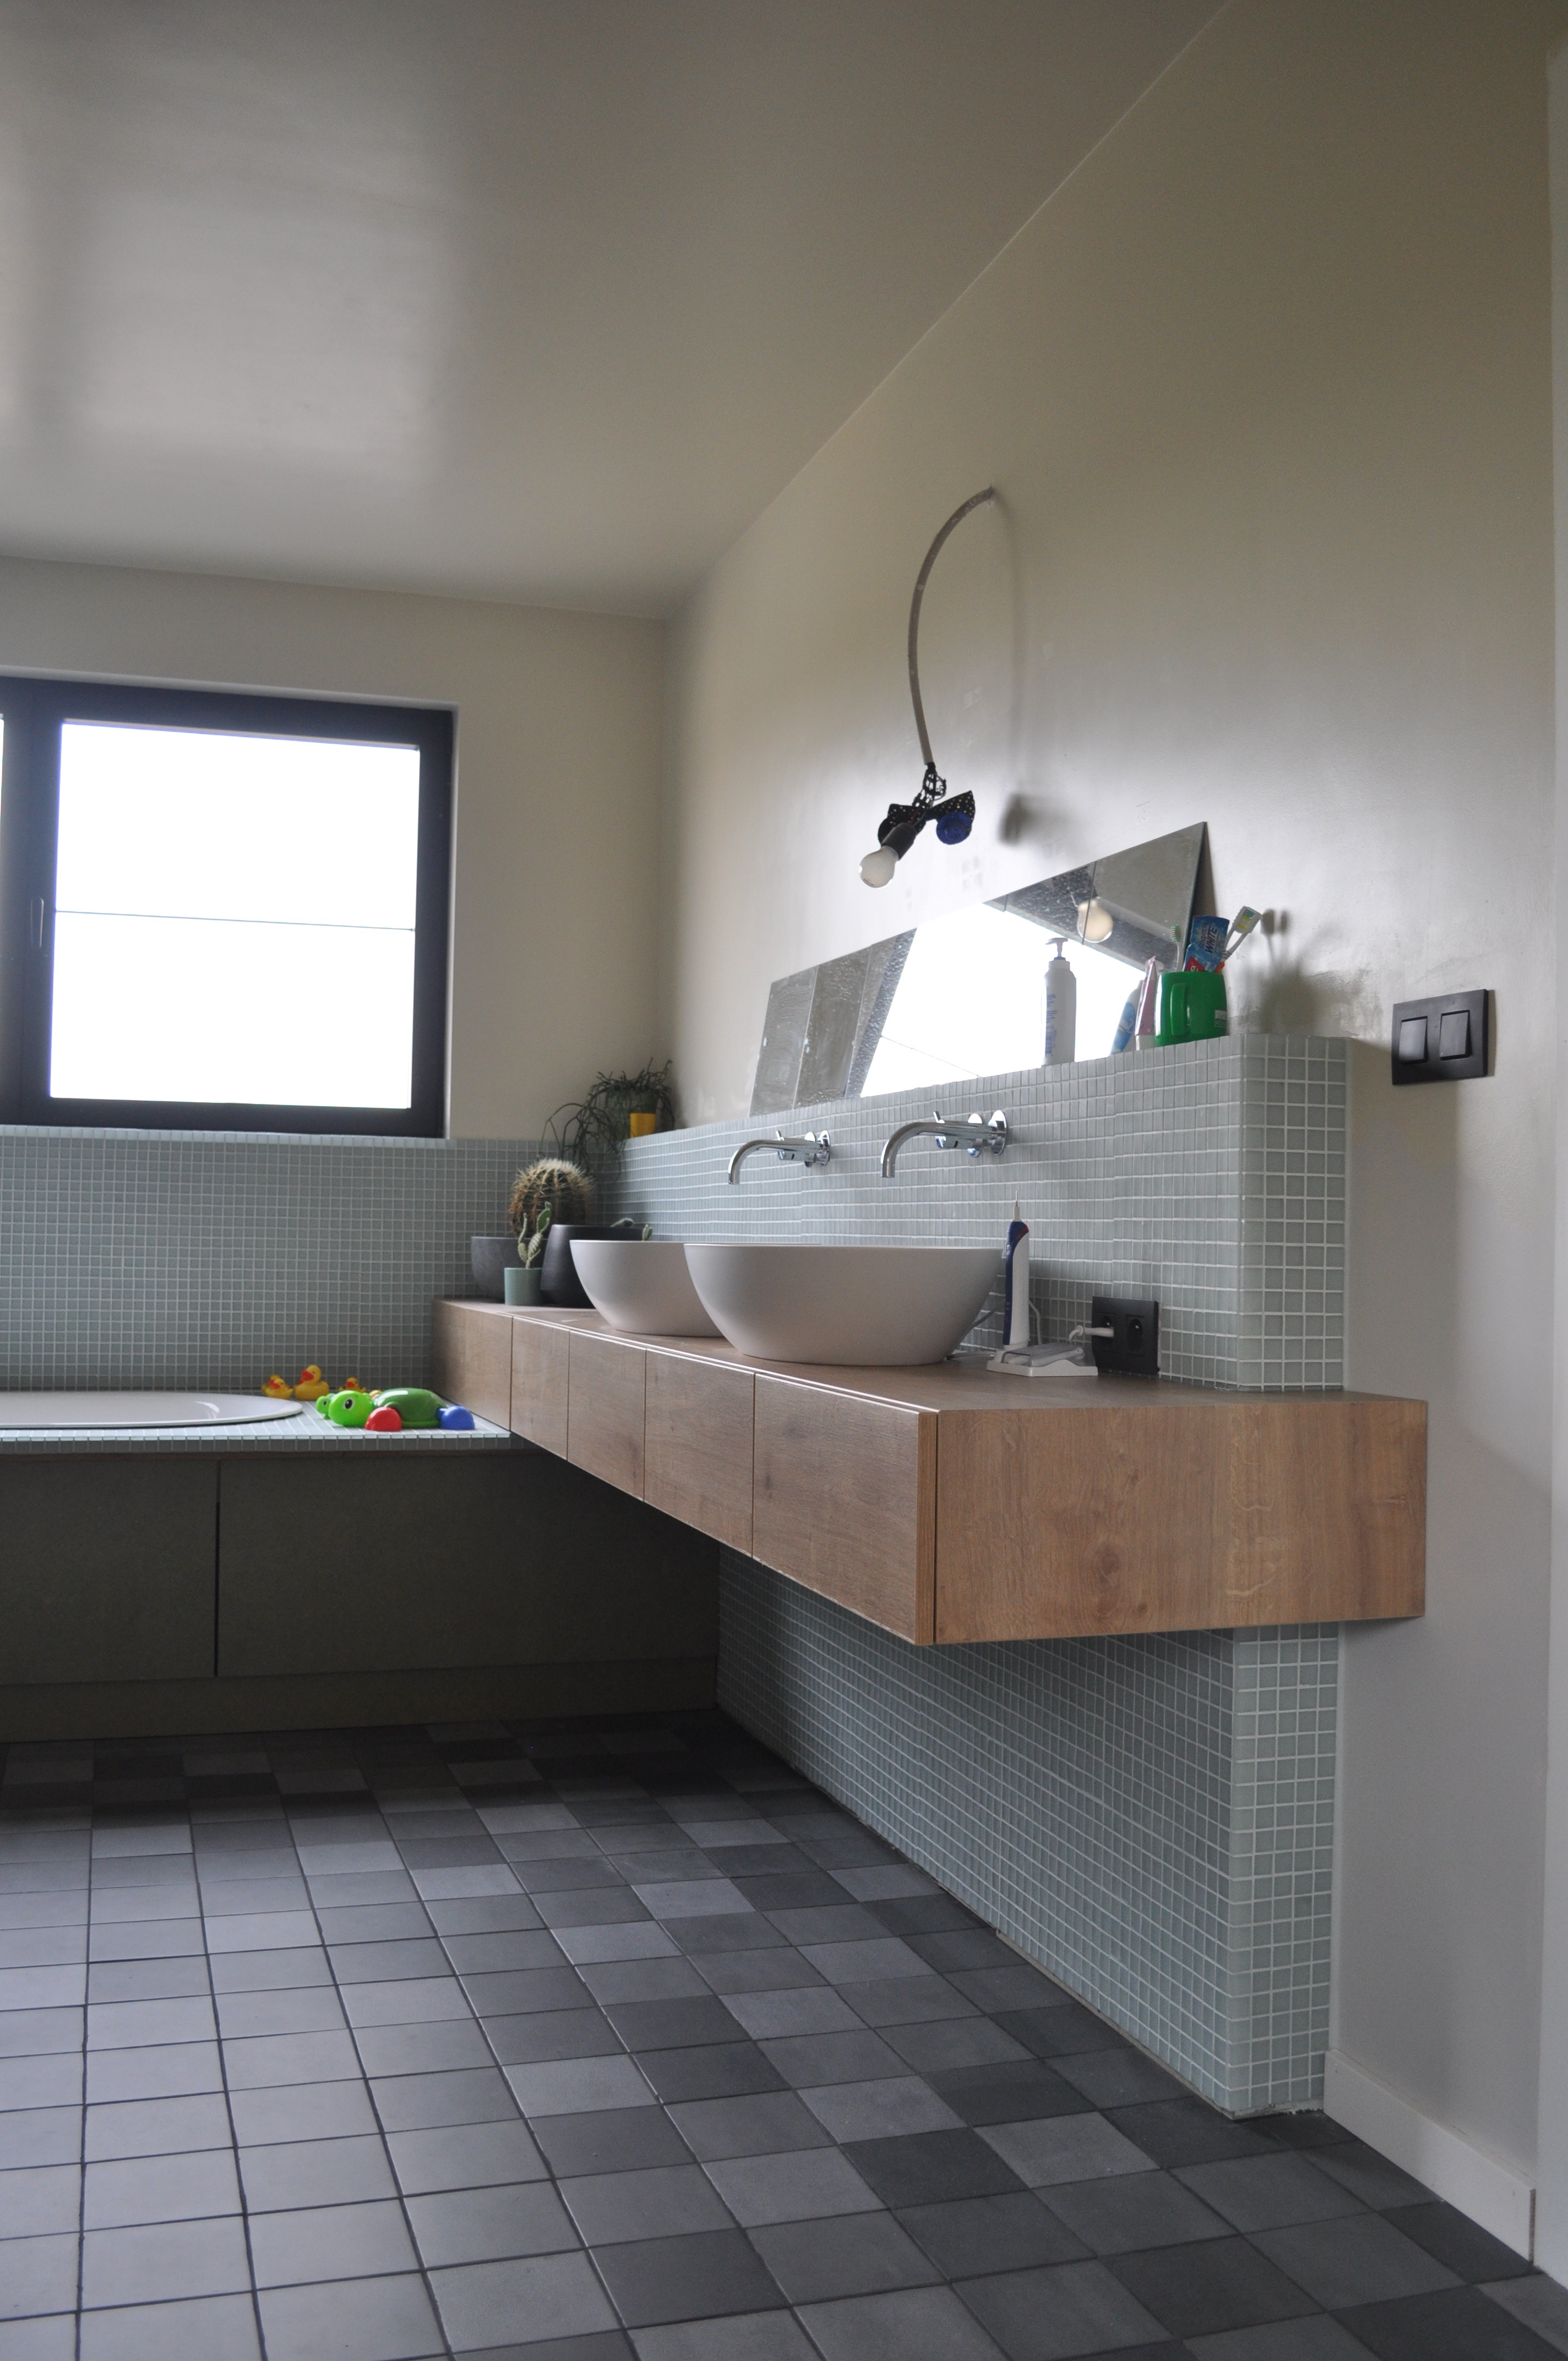 https://www.architectenbureau-aerts.be/images/interieur%20ontwerp%20Varendonk%209.jpg